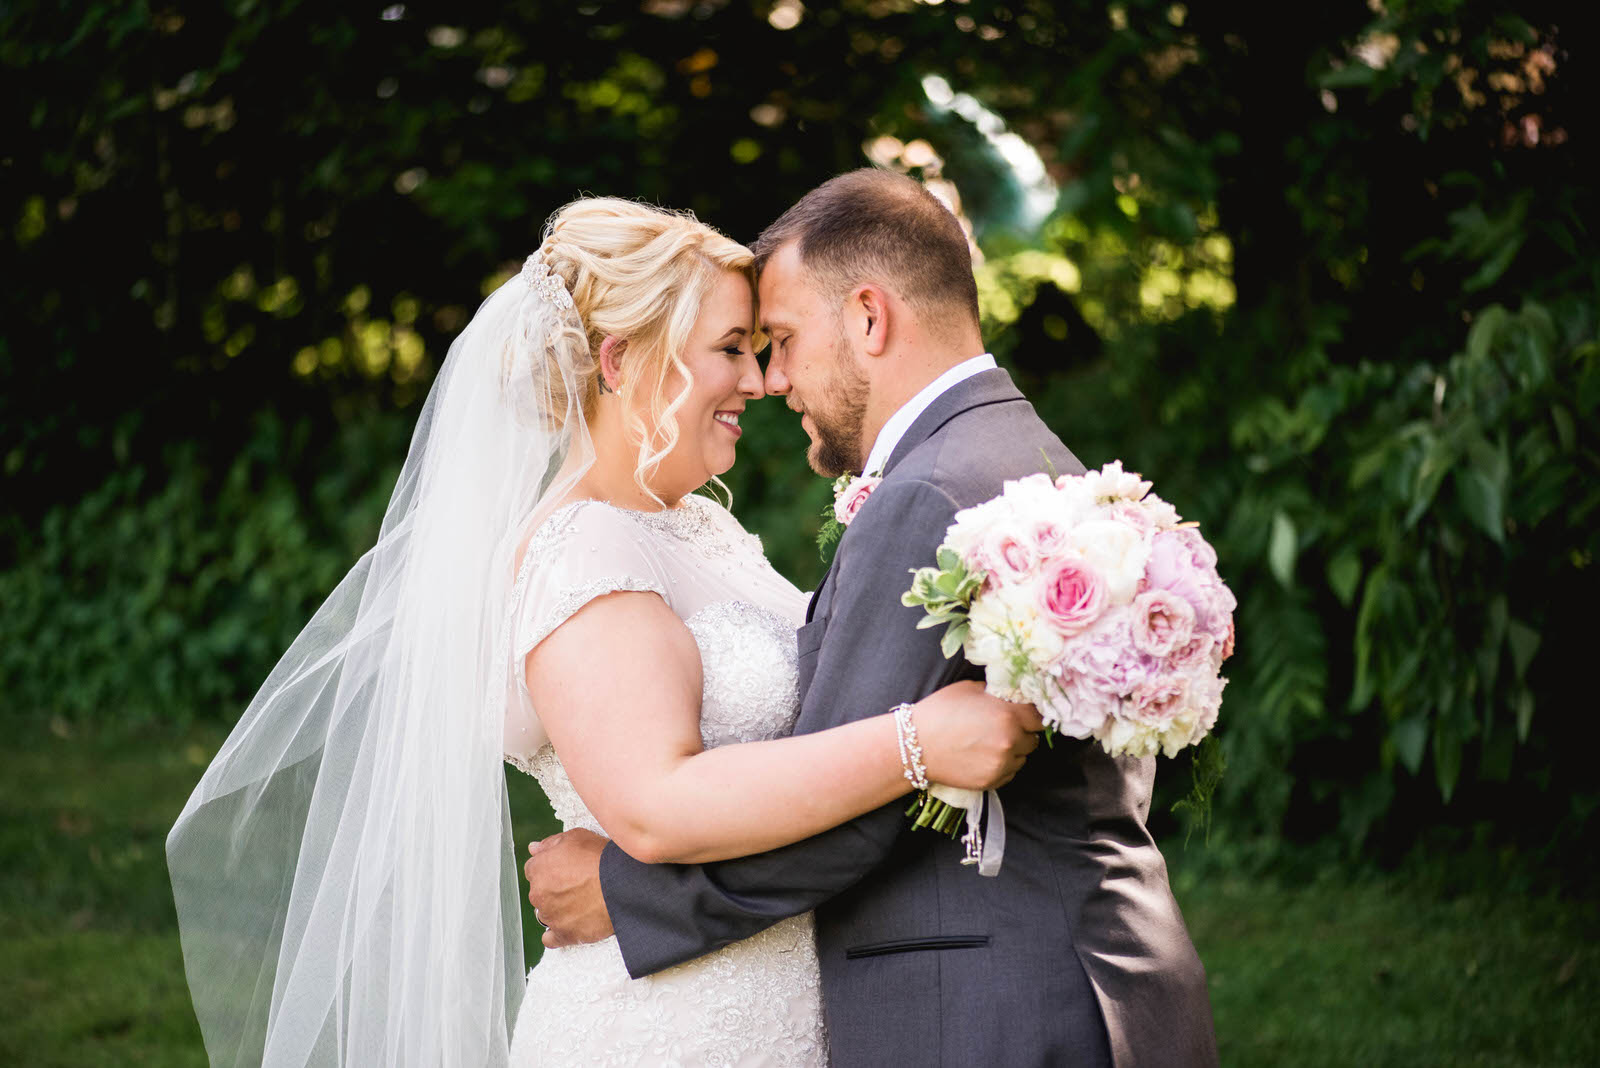 weddings-at-Holy-Cross-Greek-Orthodox-Church-and-Hall-23.jpg